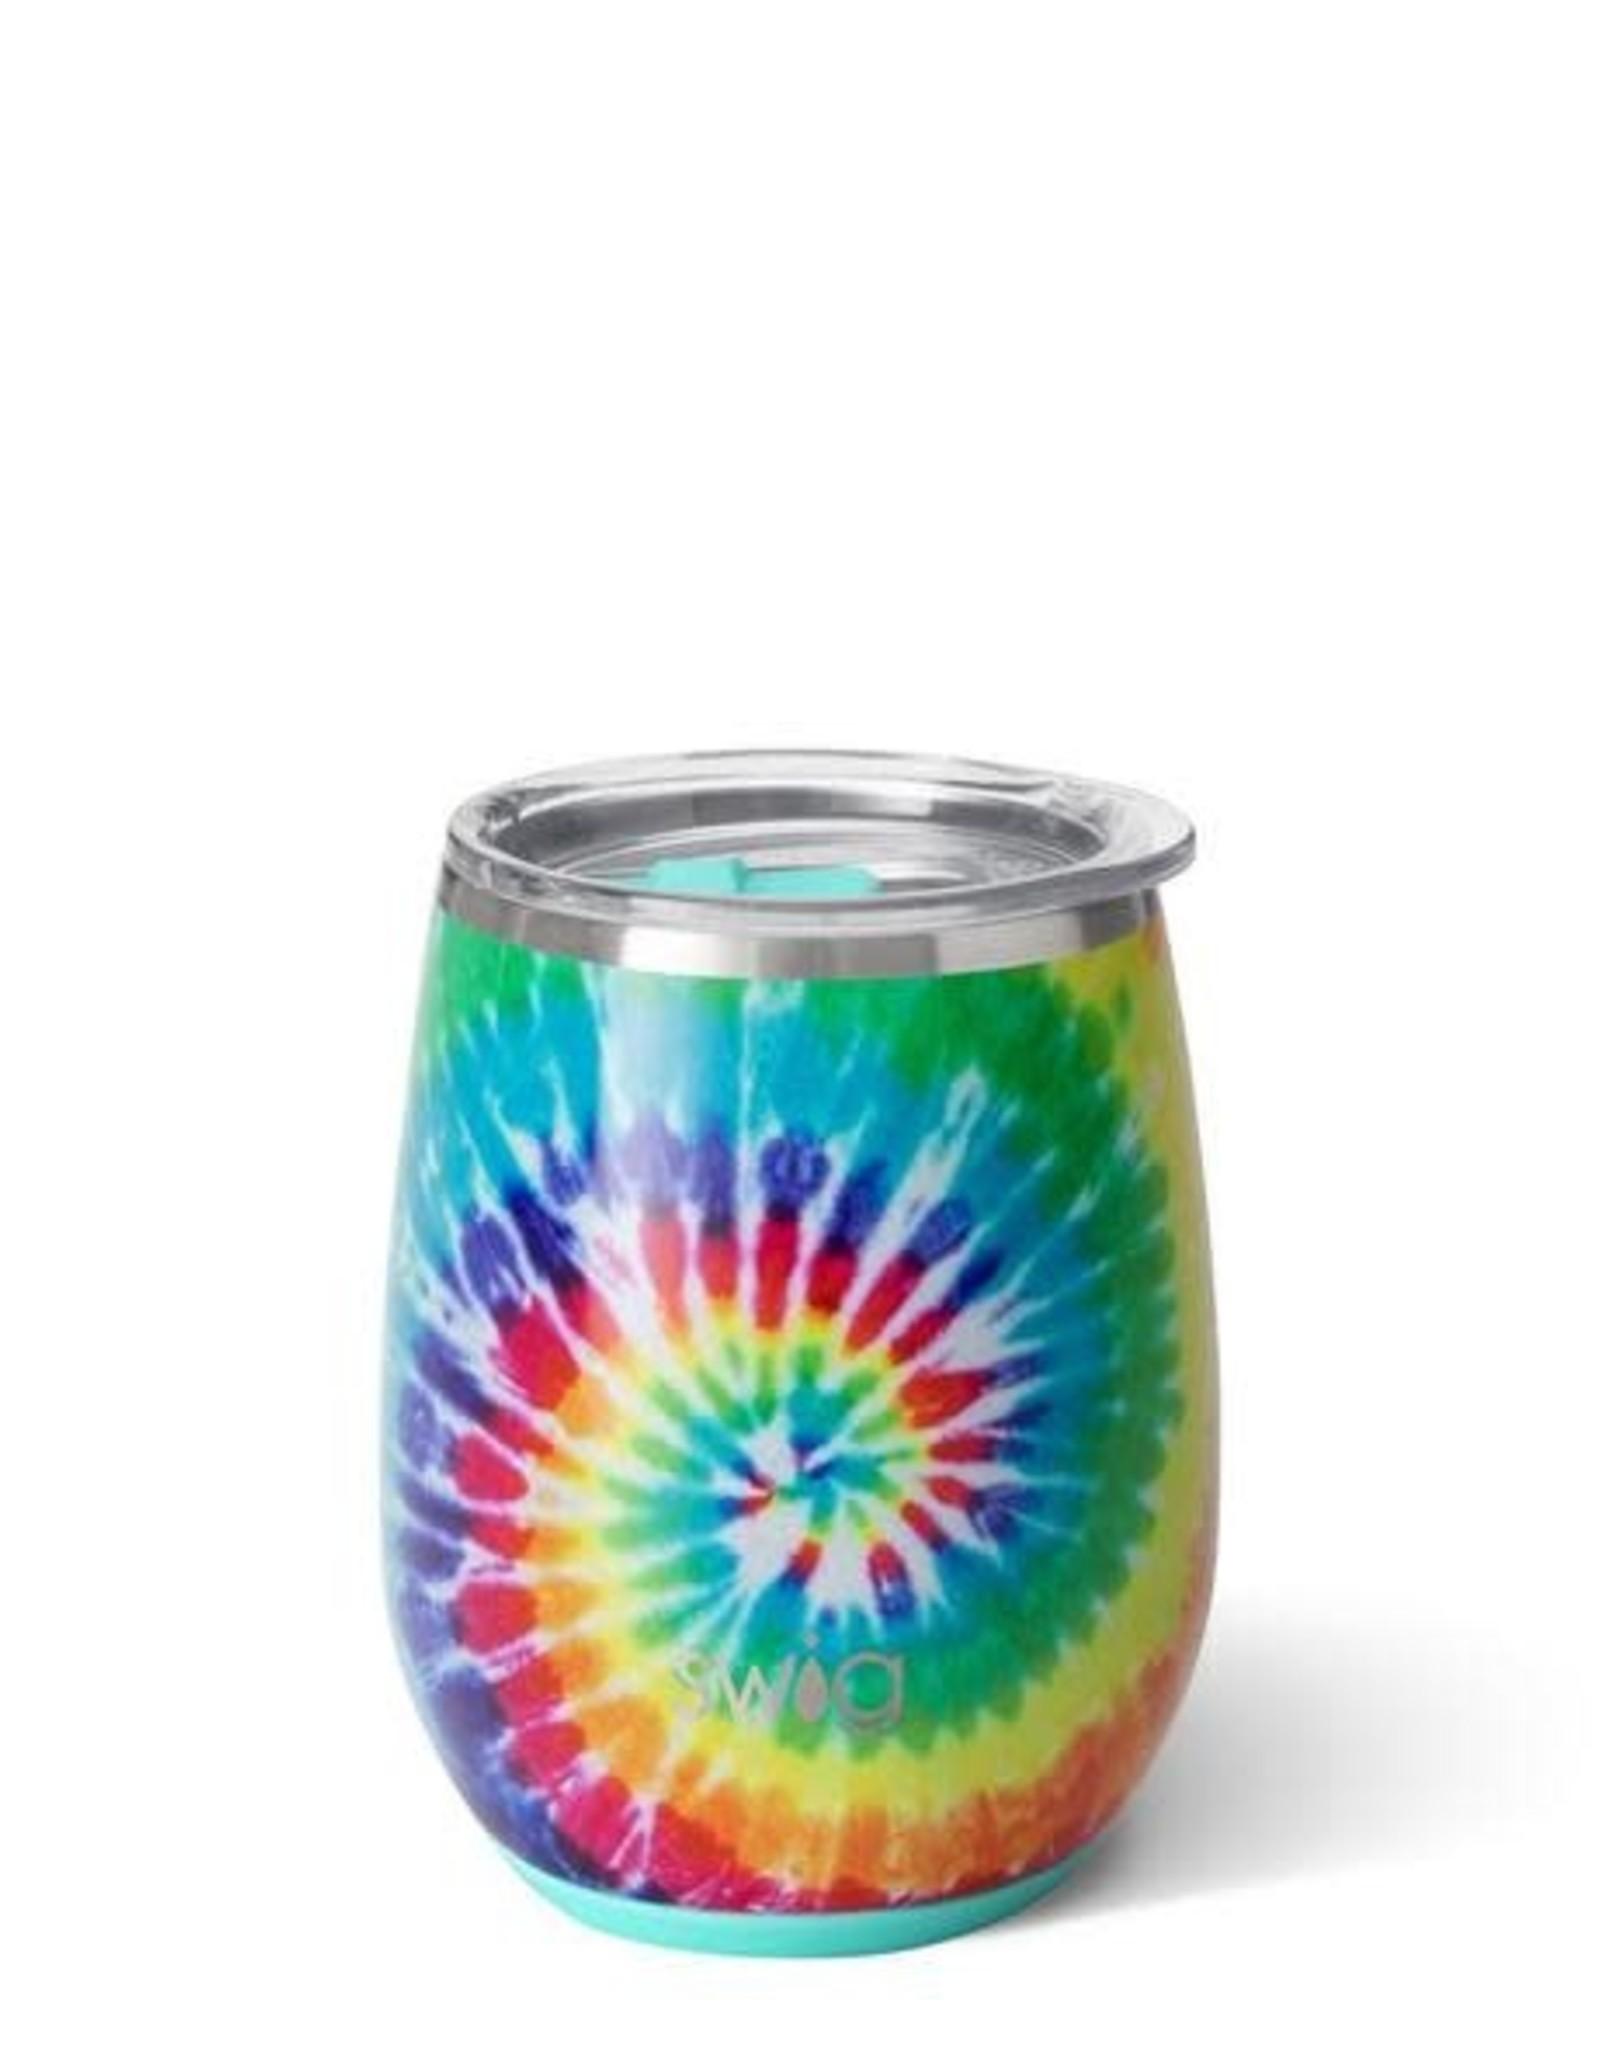 Swig Swig Drinkware Swirled Peace